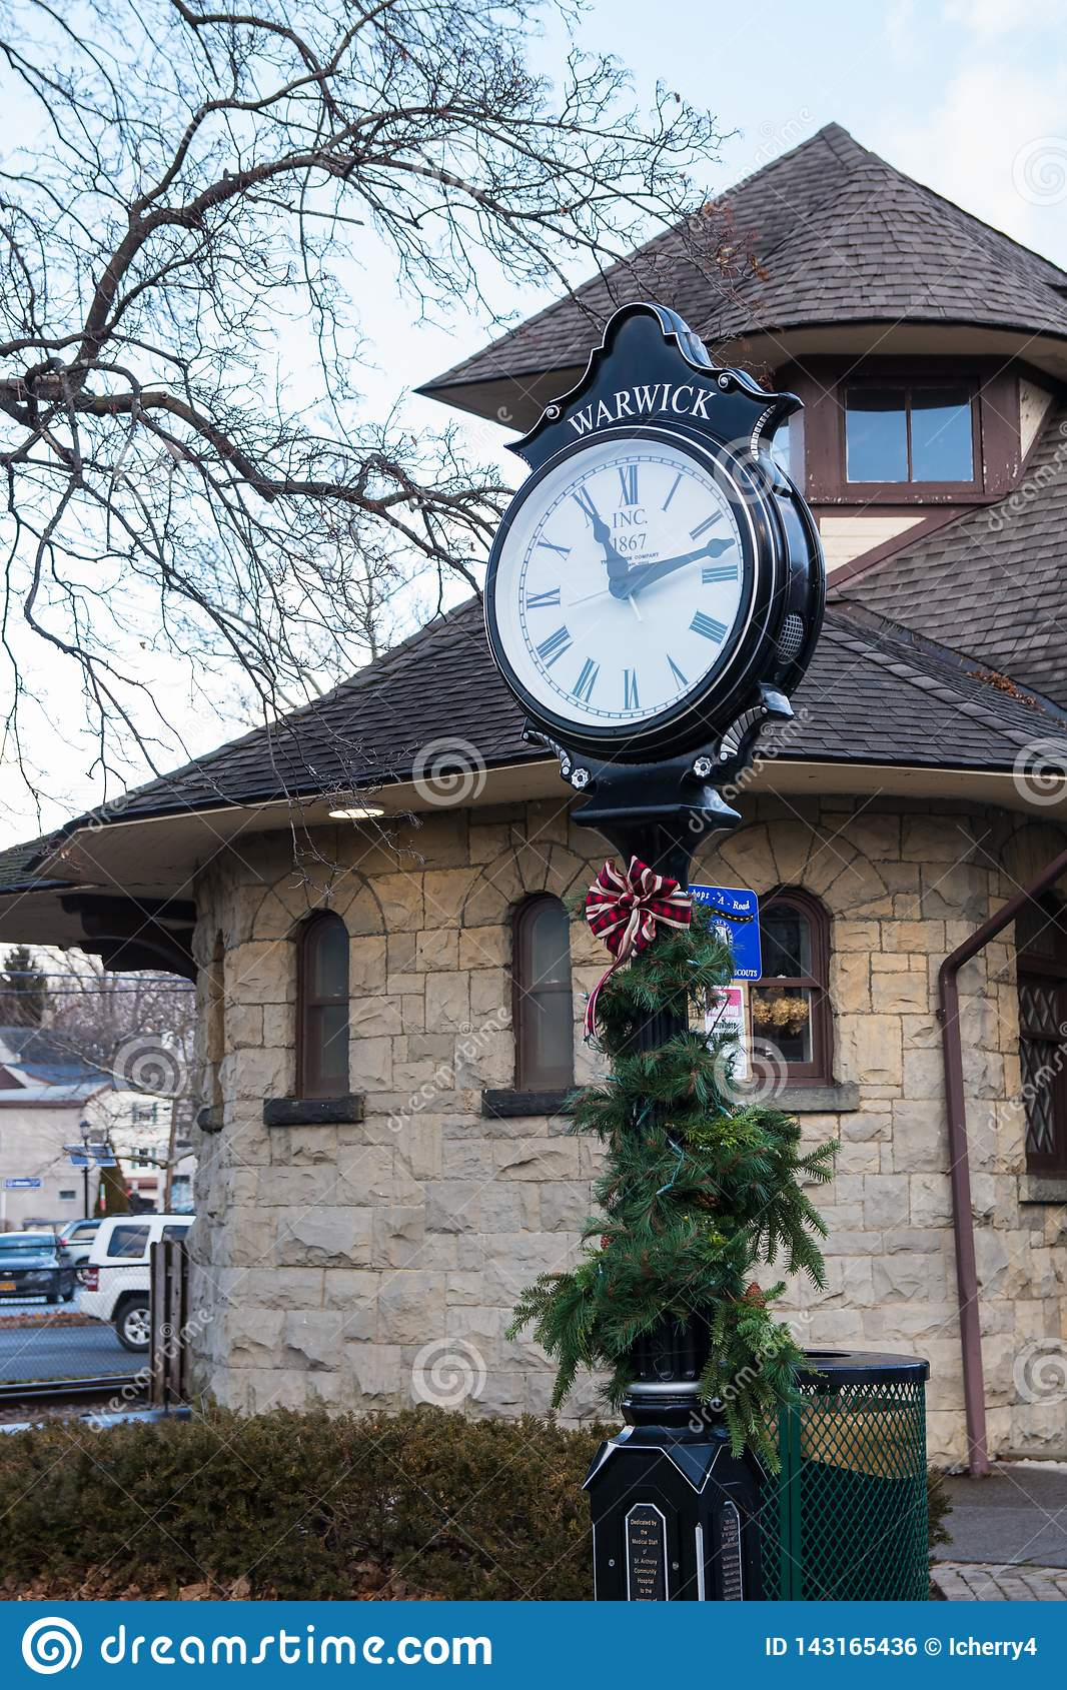 Warwick, Νέα Υόρκη Ηνωμένες Πολιτείες - 4 Ιανουαρίου 2019: Πράσινοι μετα ρολόι και σταθμός σιδηροδρόμου Warwick